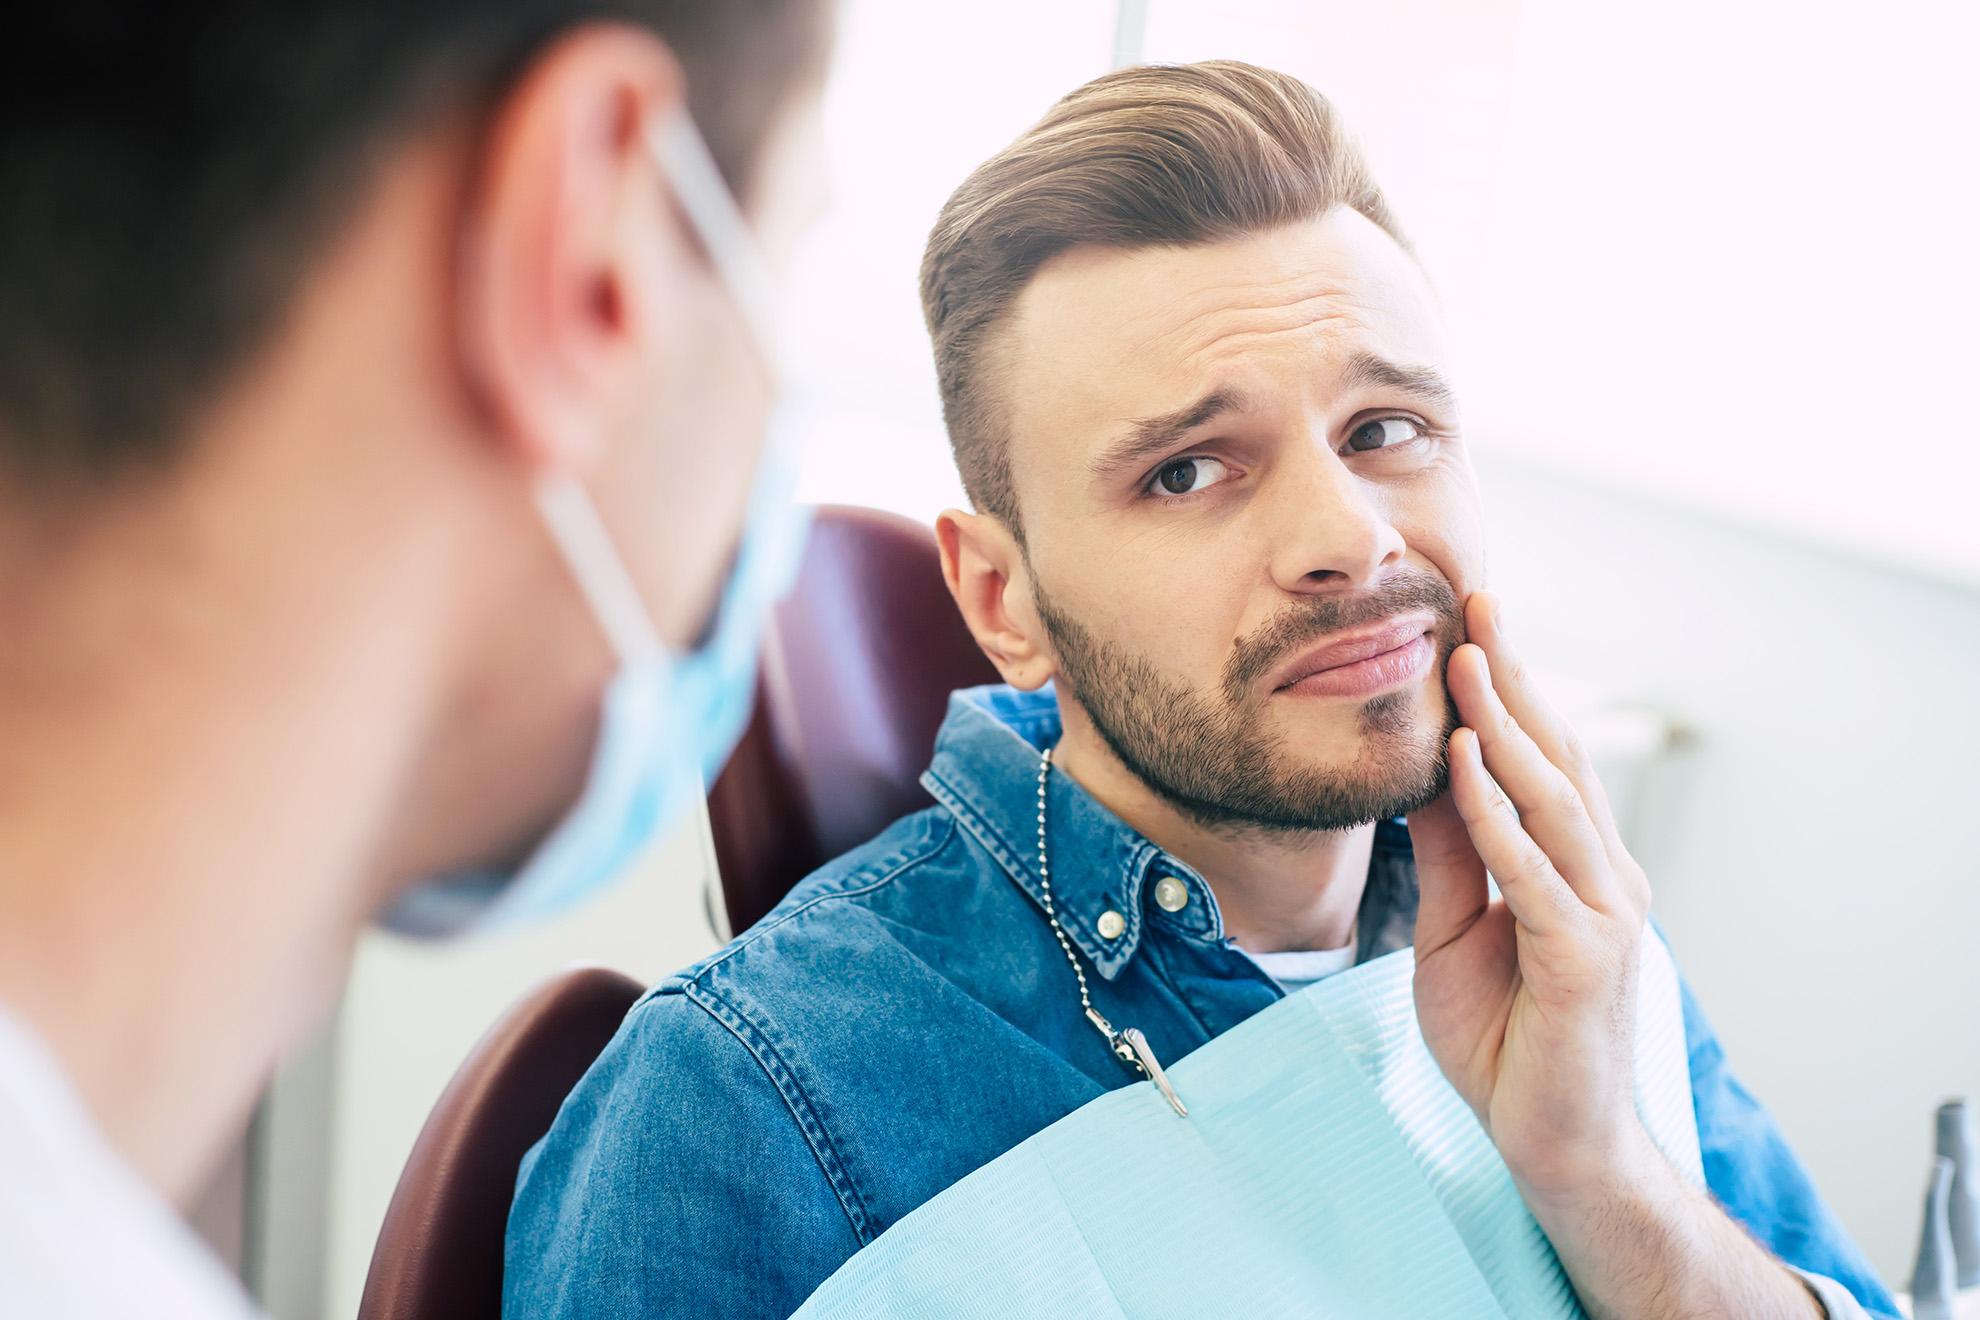 Tourisme dentaire low cost